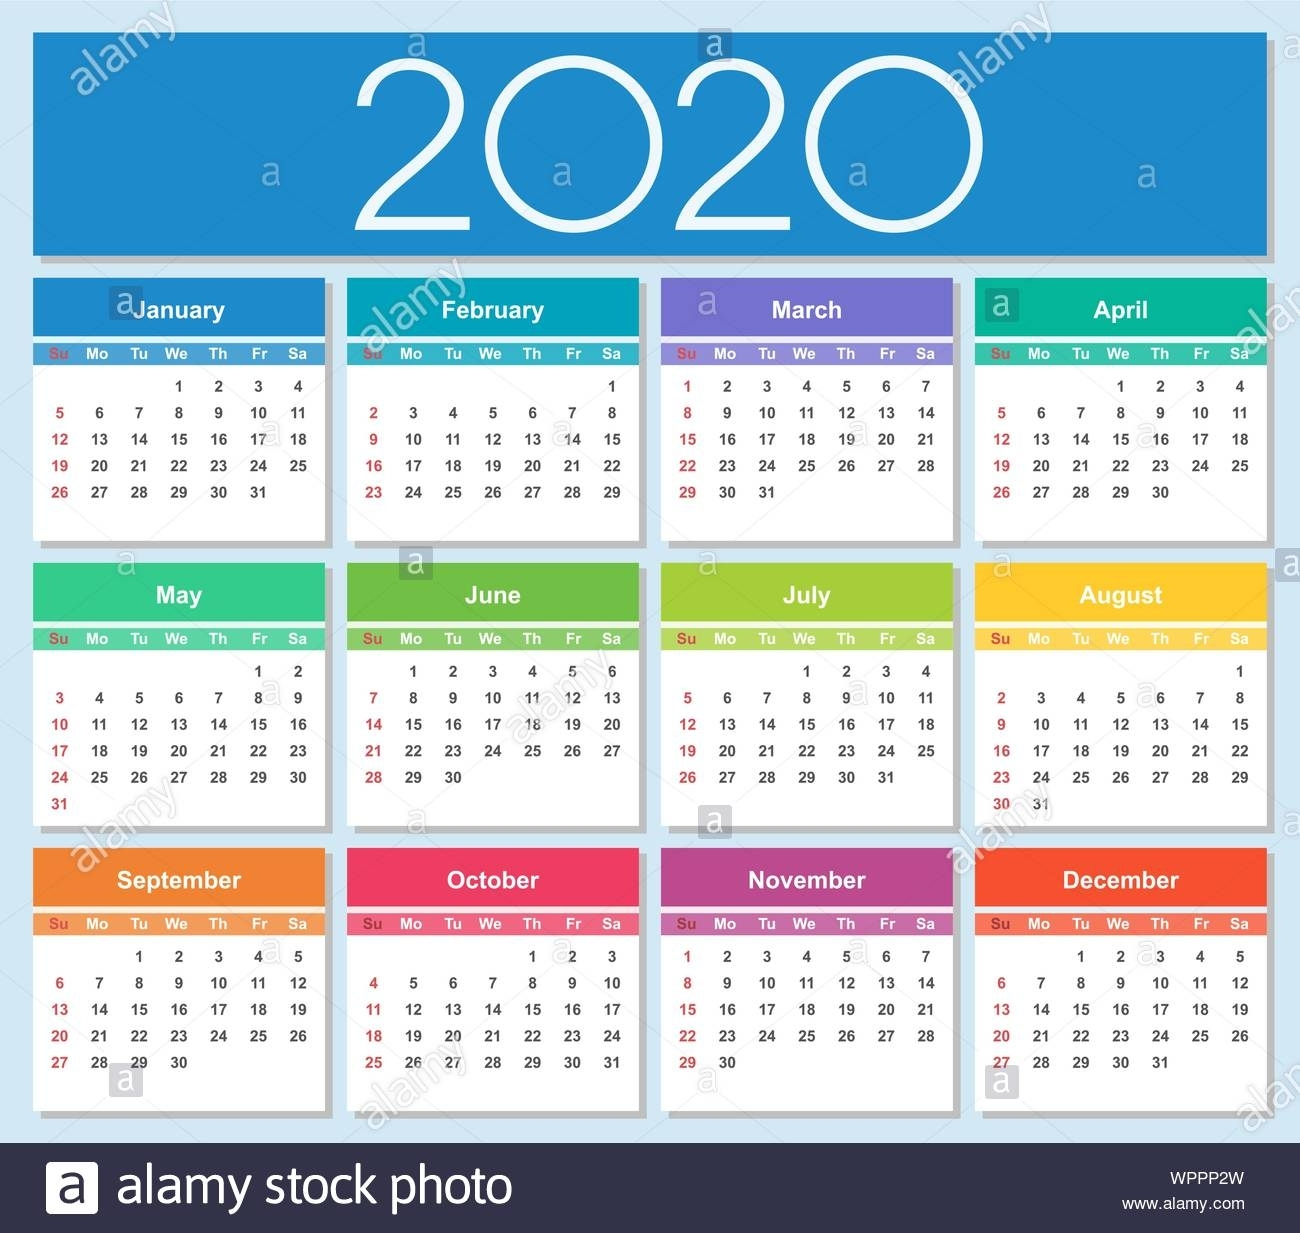 Colorful Year 2020 Calendar. Week Starts On Sunday. Isolated